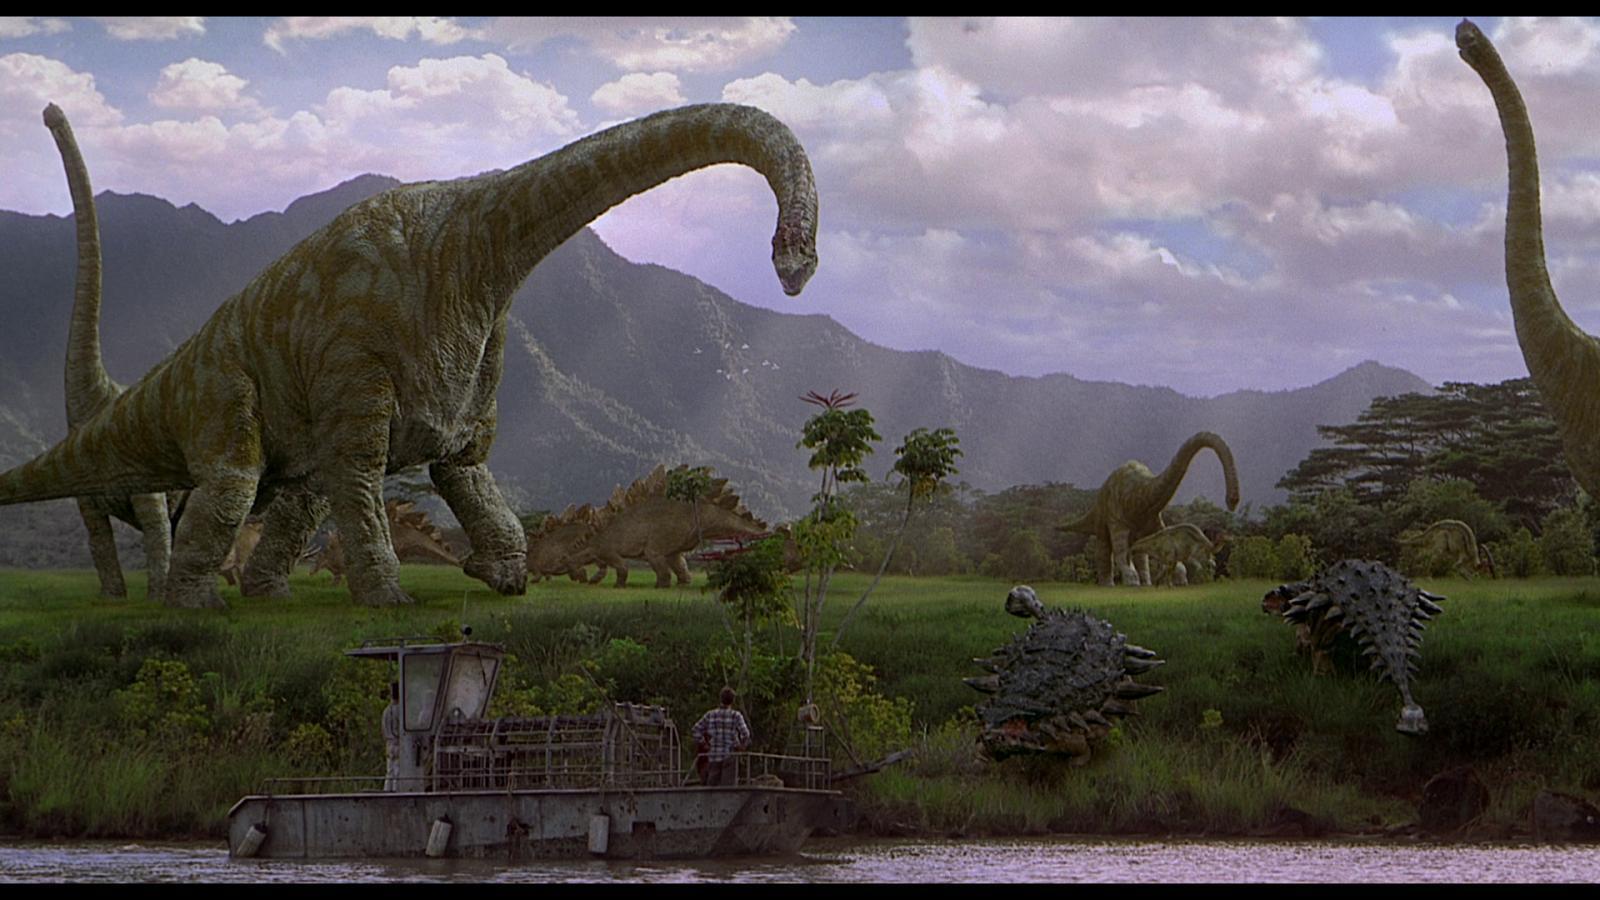 Jurassic Park Backgrounds - Wallpaper Cave